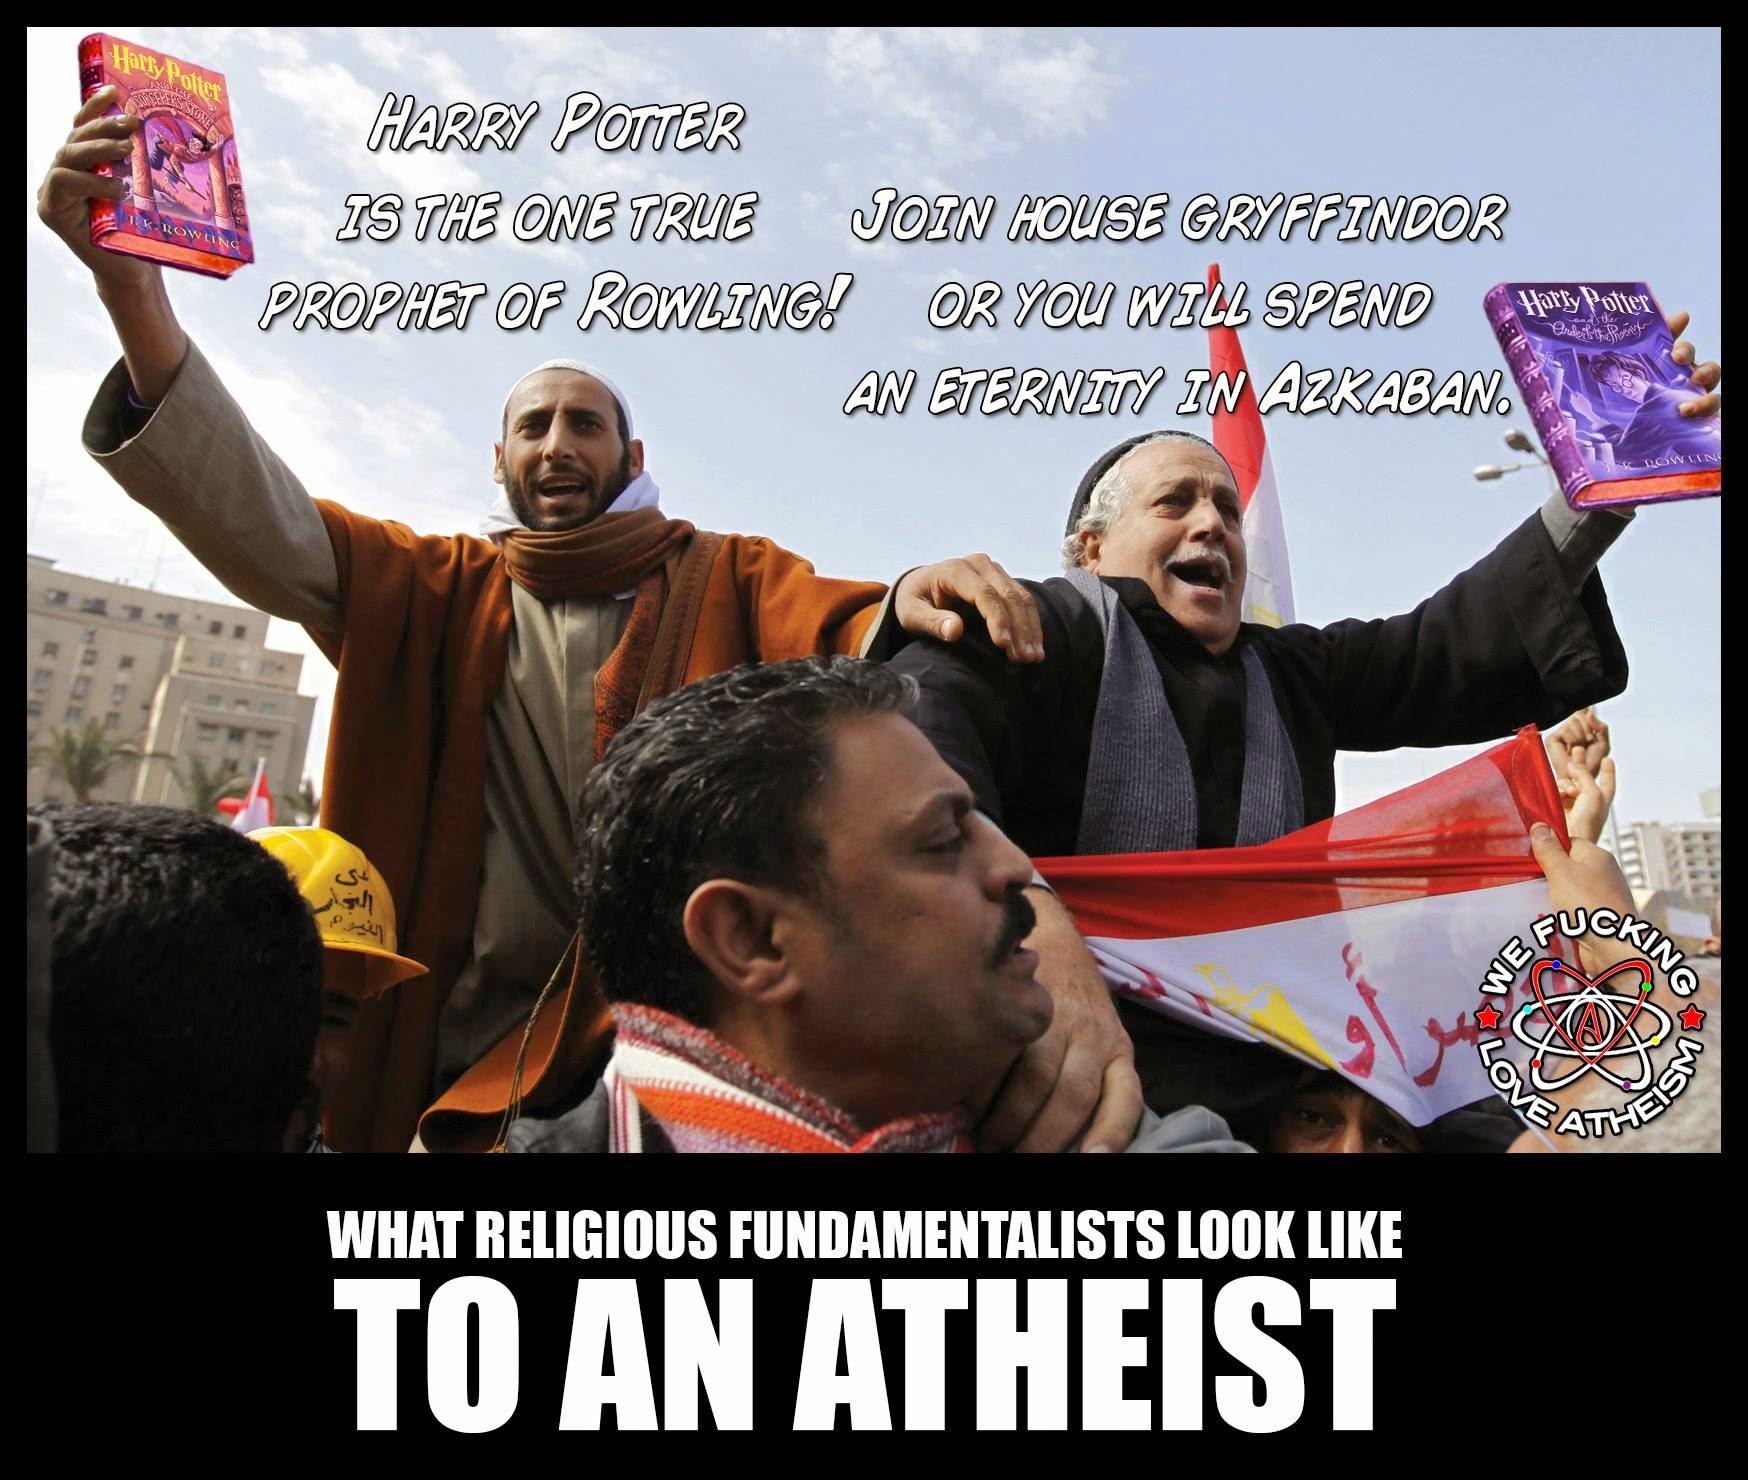 causes of religious fundamentalism pdf